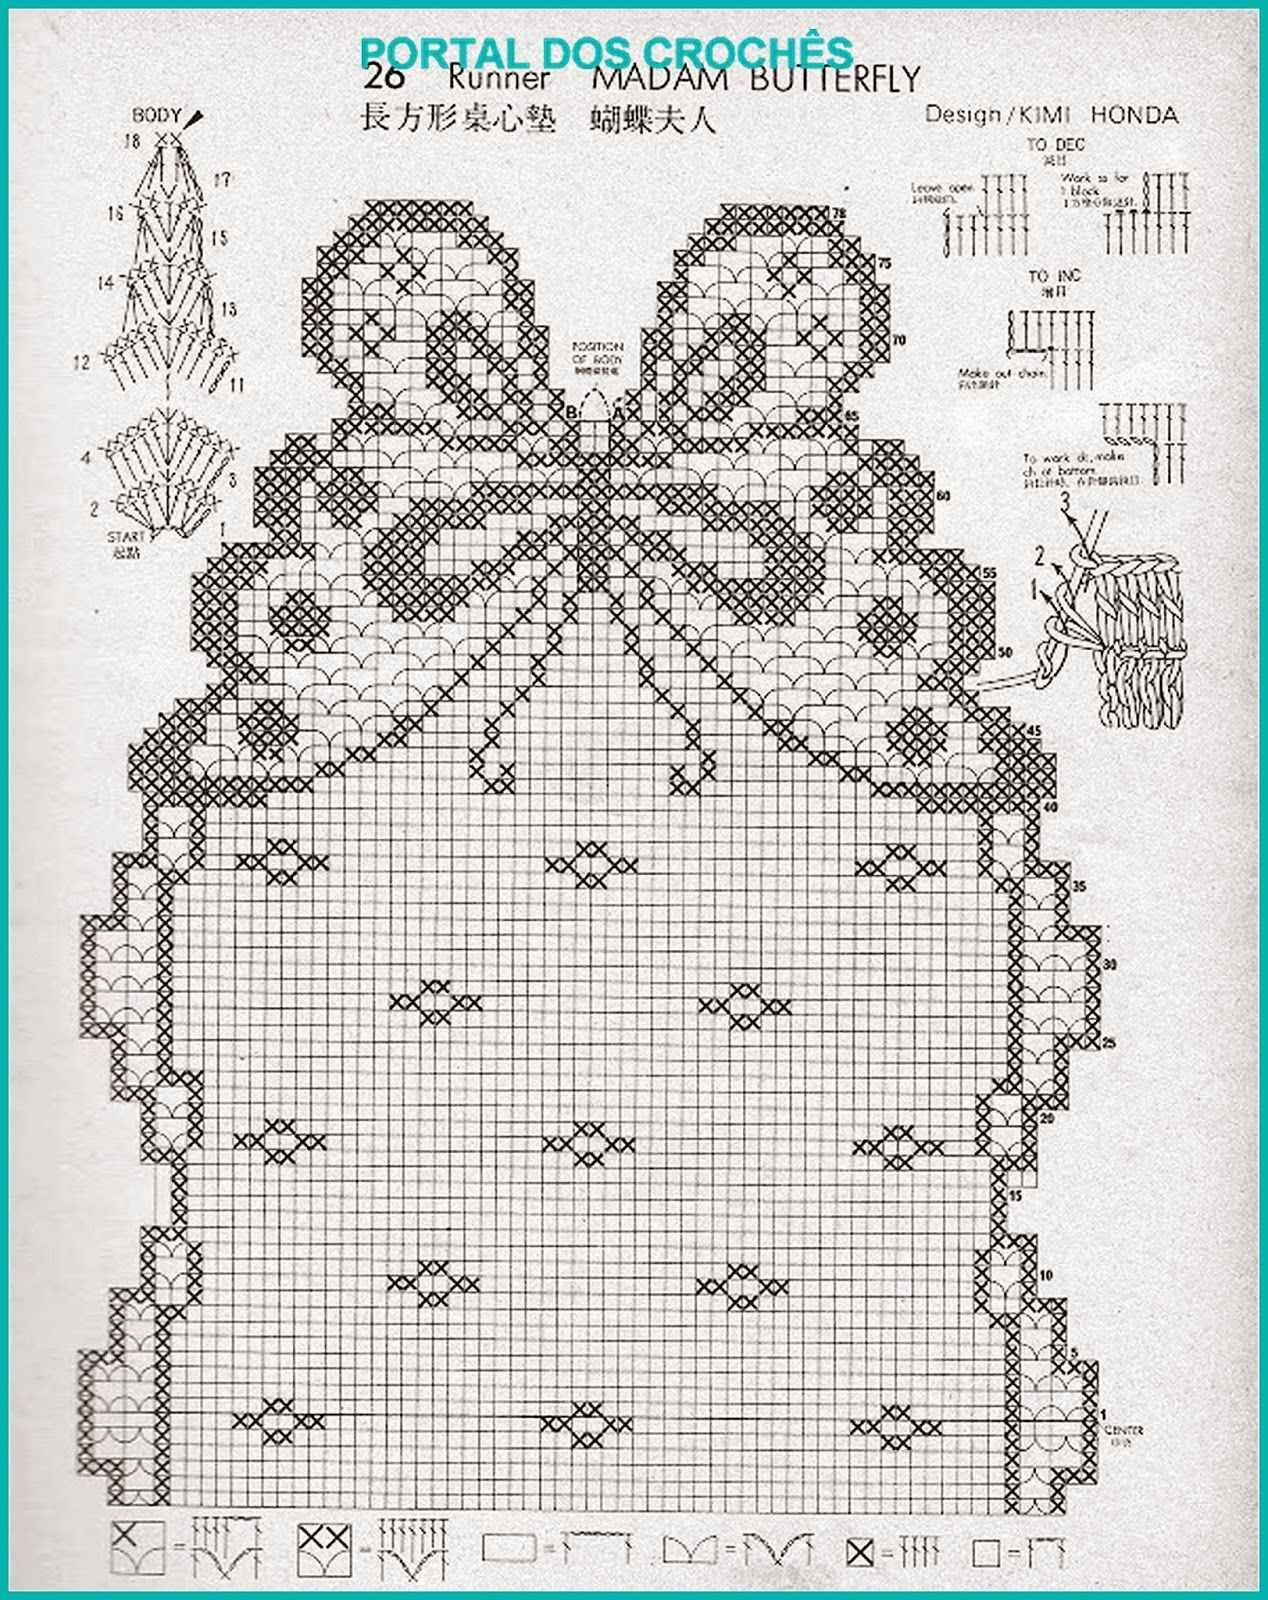 Centro Em Croche Com Borboletas Filet Crochet Tapete De Croche